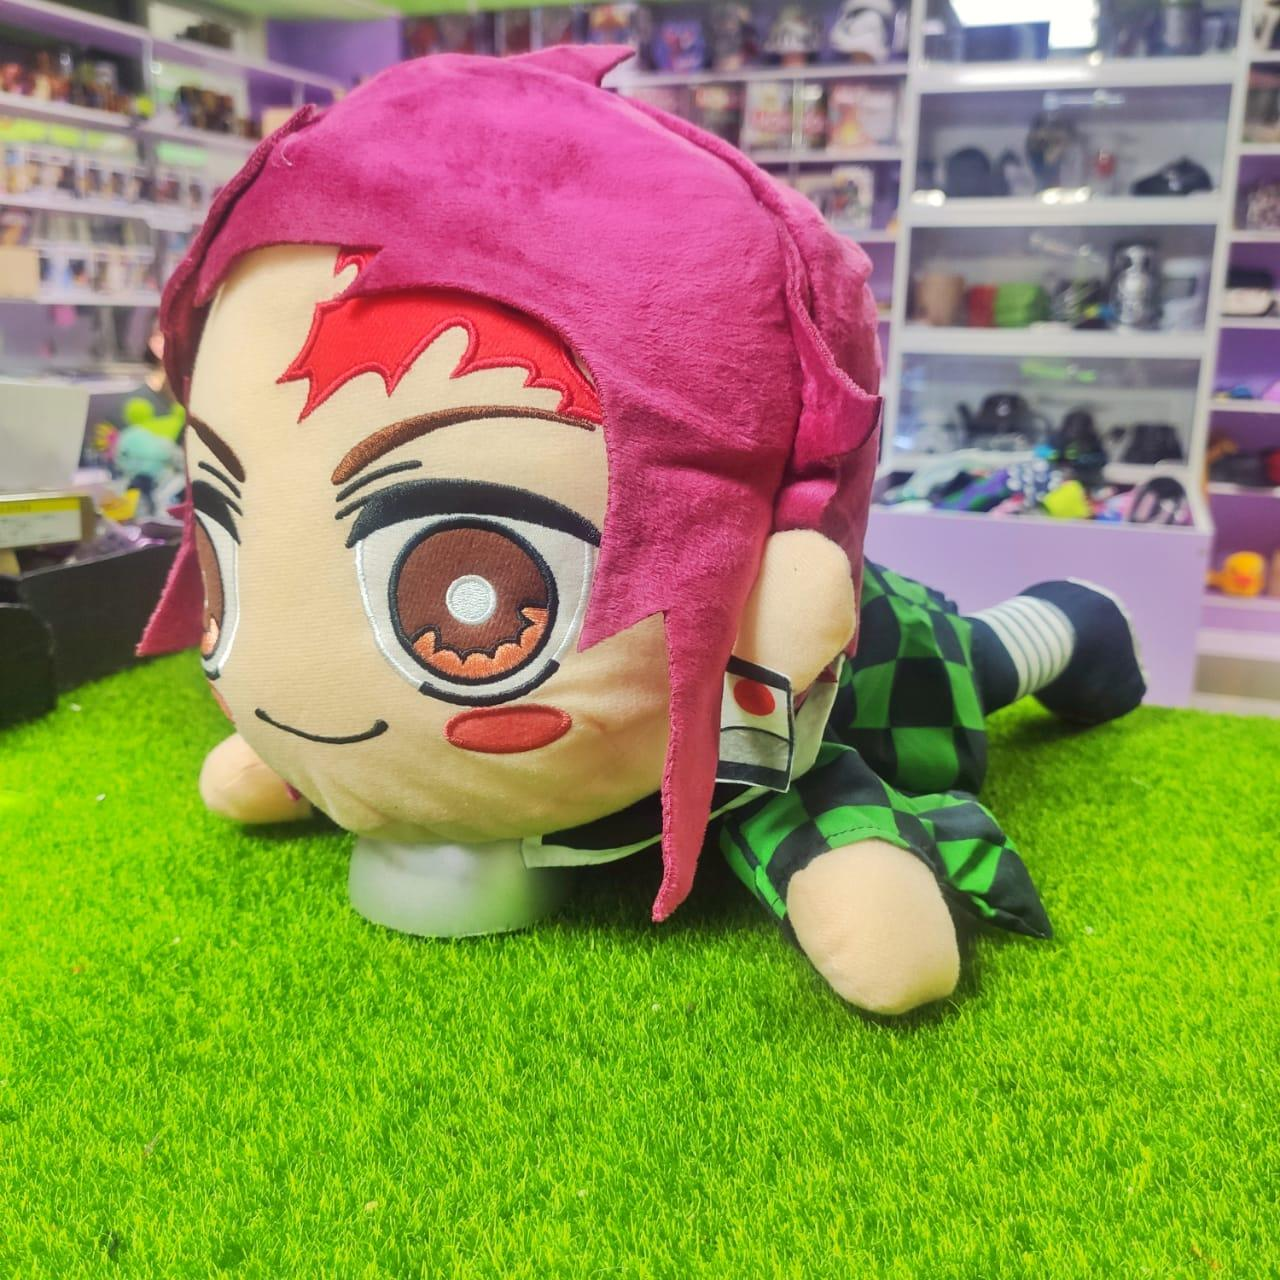 Плюшевая игрушка Танджиро Камадо